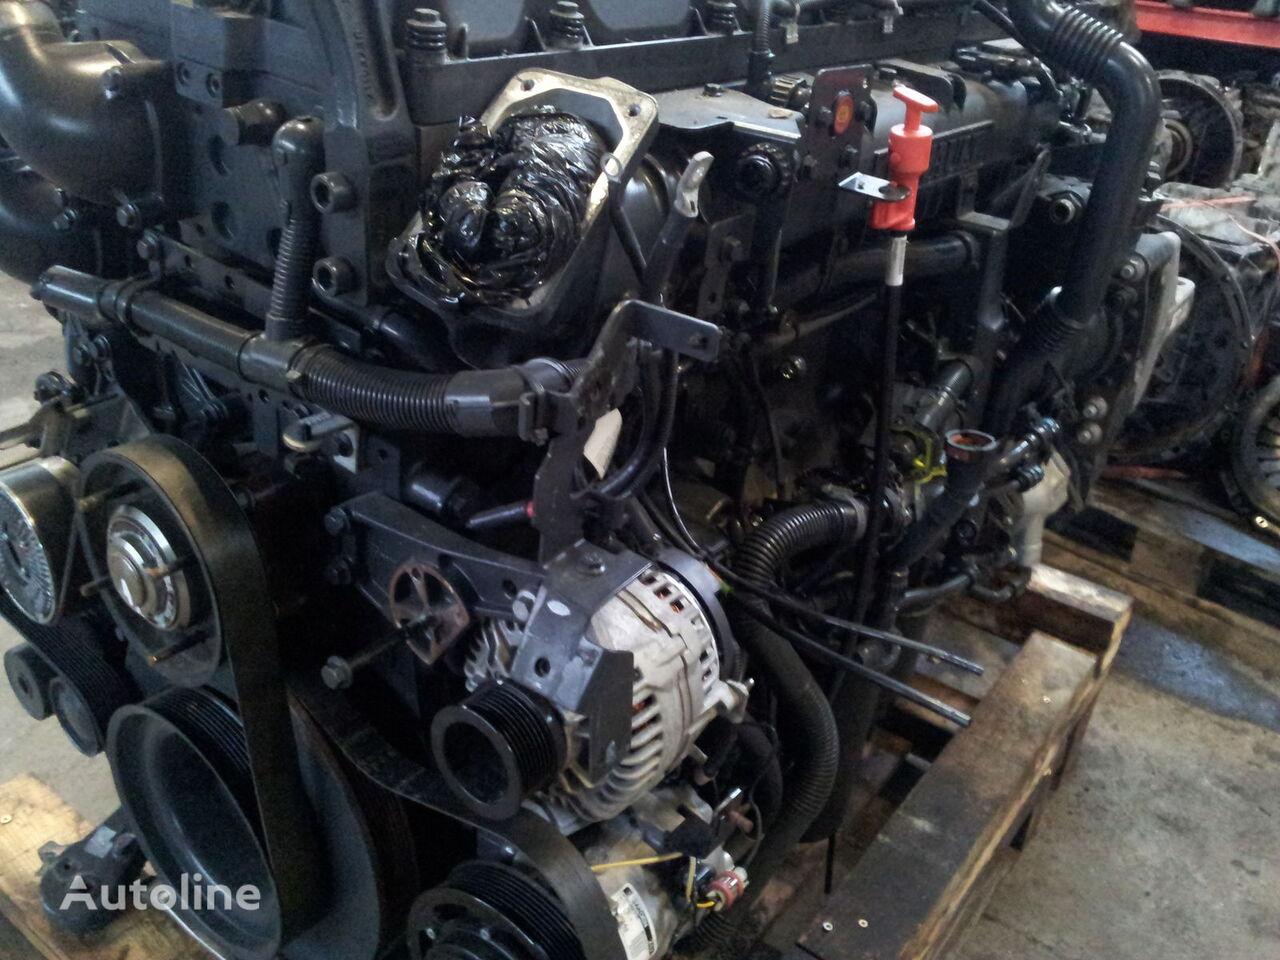 RENAULT MAGNUM DXI engine EURO 5 emission DXI13, 500PS (368KW), 520PS (3 engine for RENAULT Magnum tractor unit